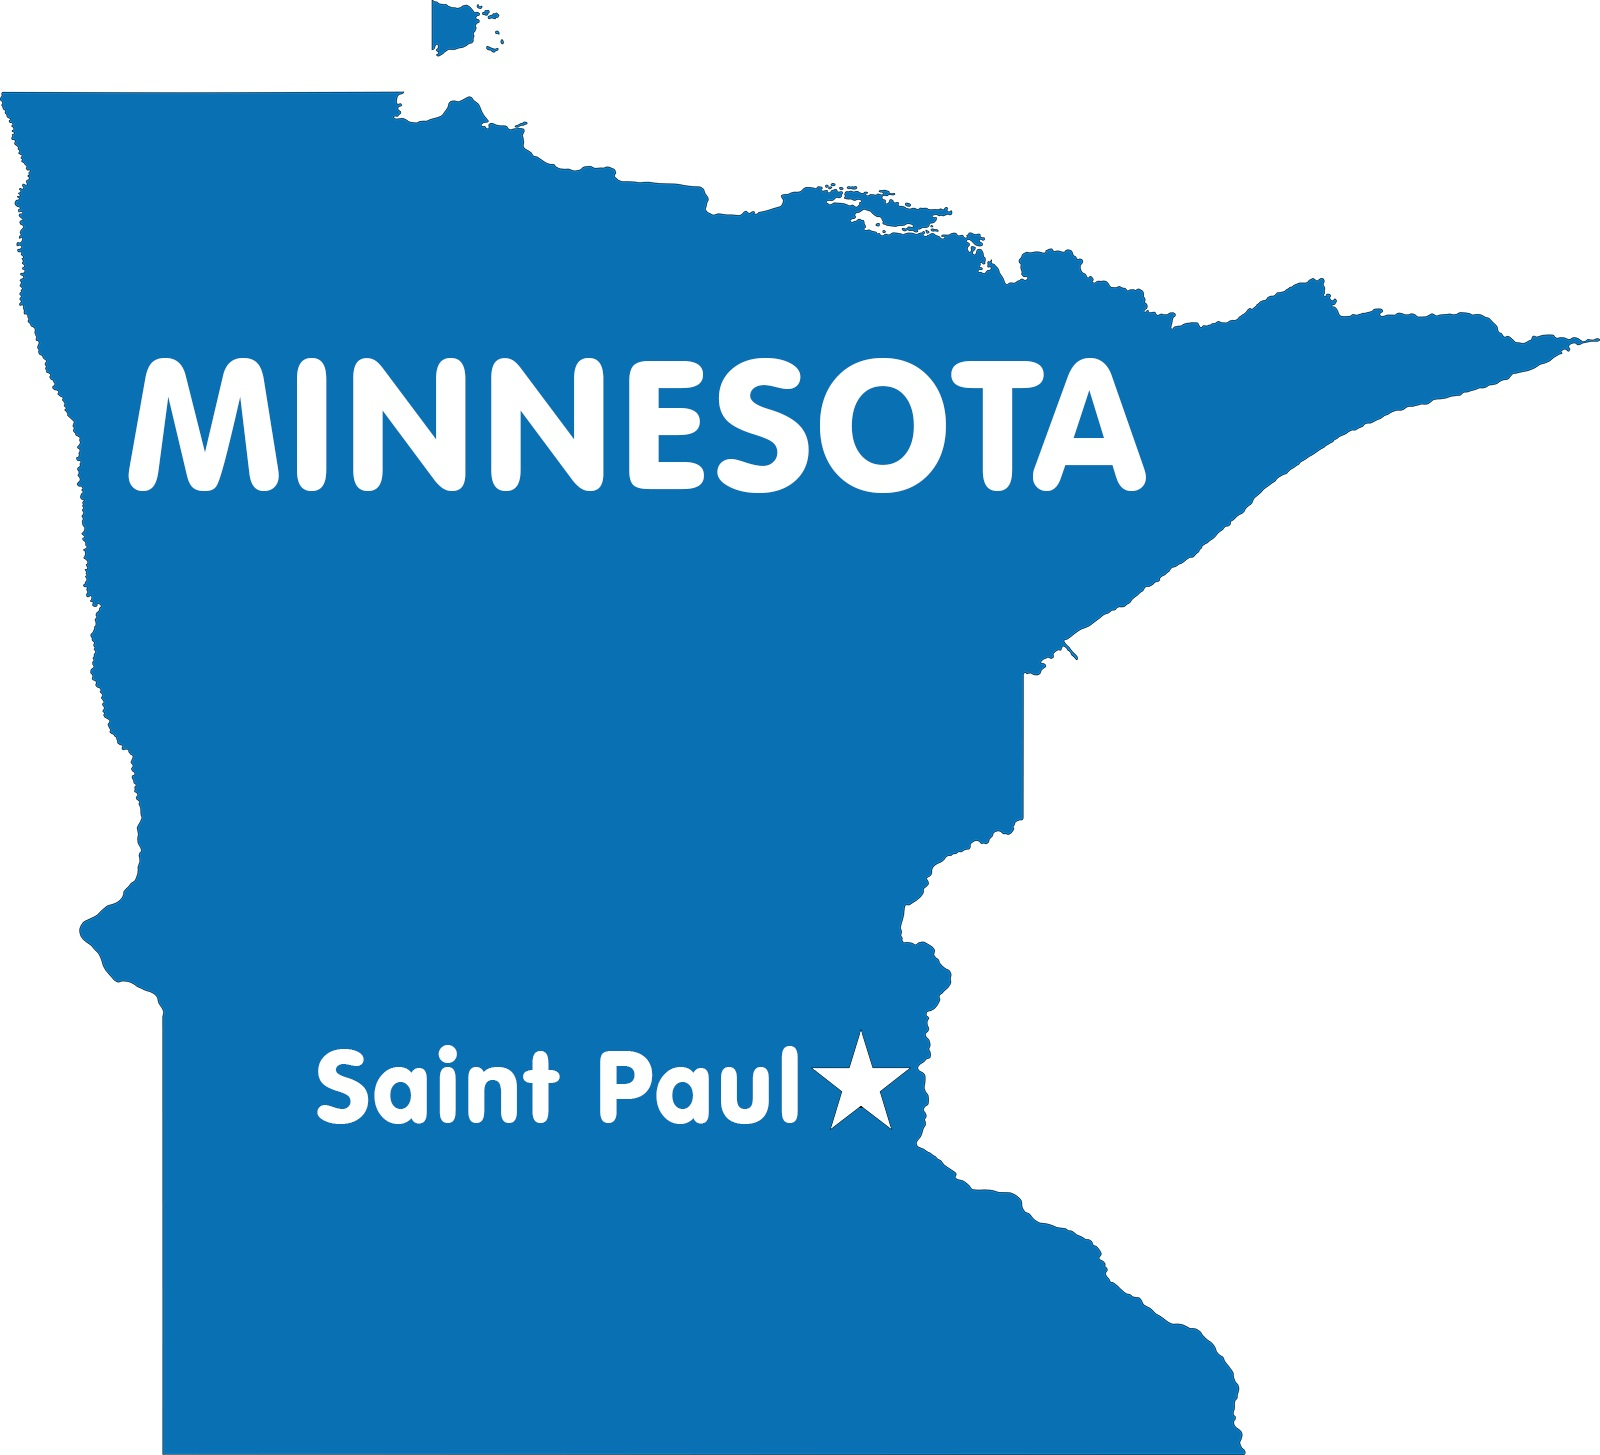 Minnesota Capital Map | Large Printable High Resolution and Standard Map